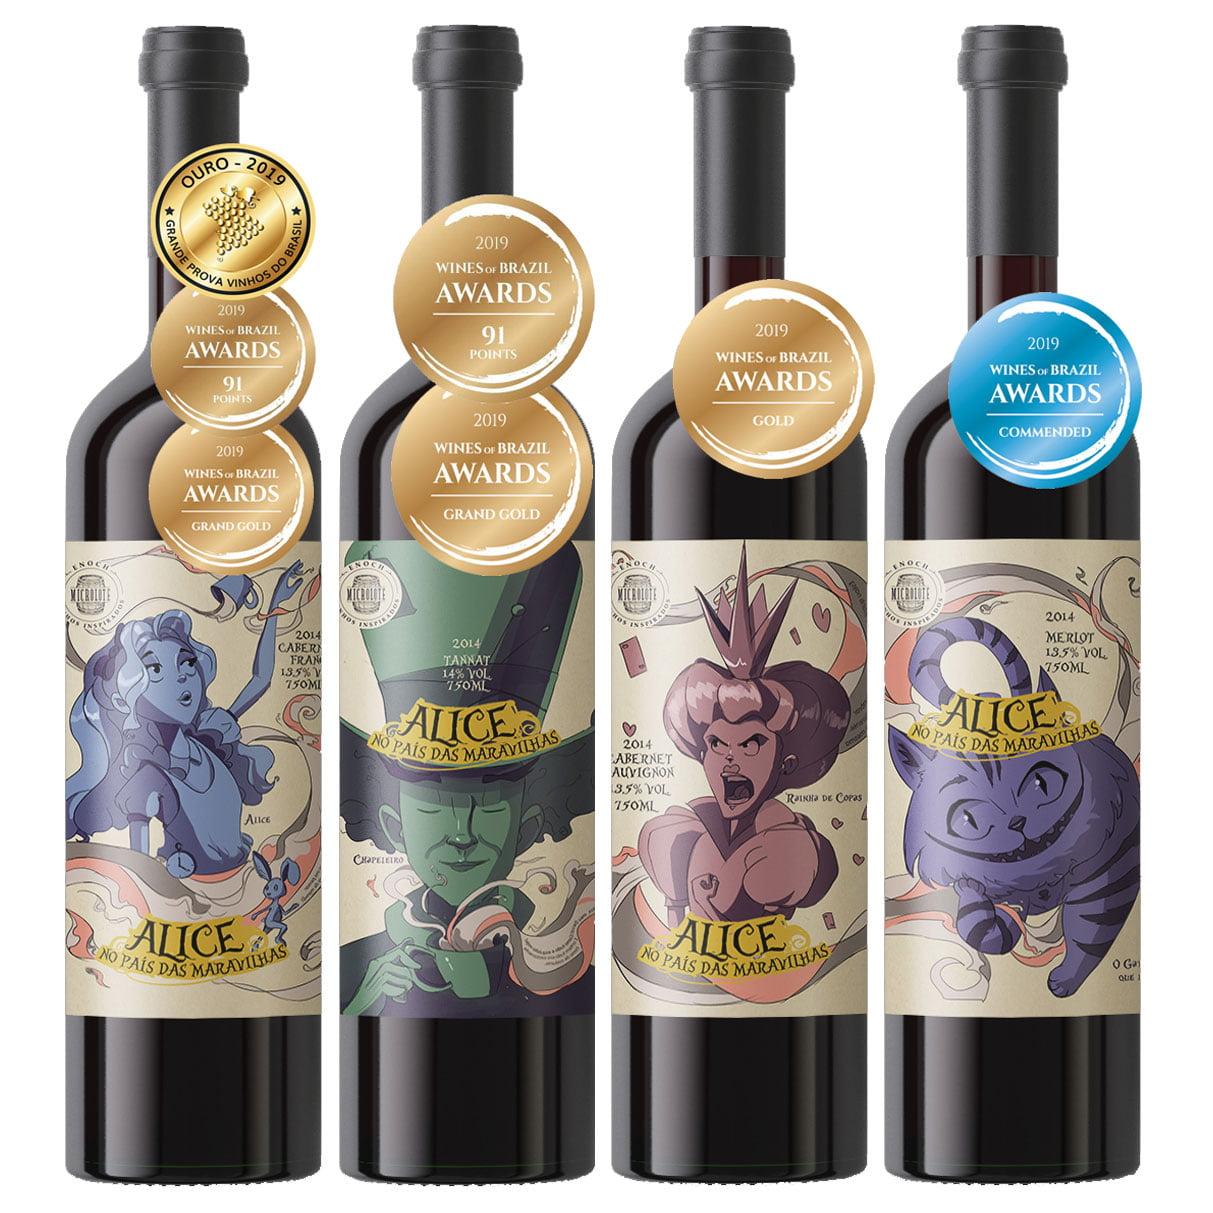 Kit Enos Enoch Premium Alice no País das Maravilhas com 4 Garrafas